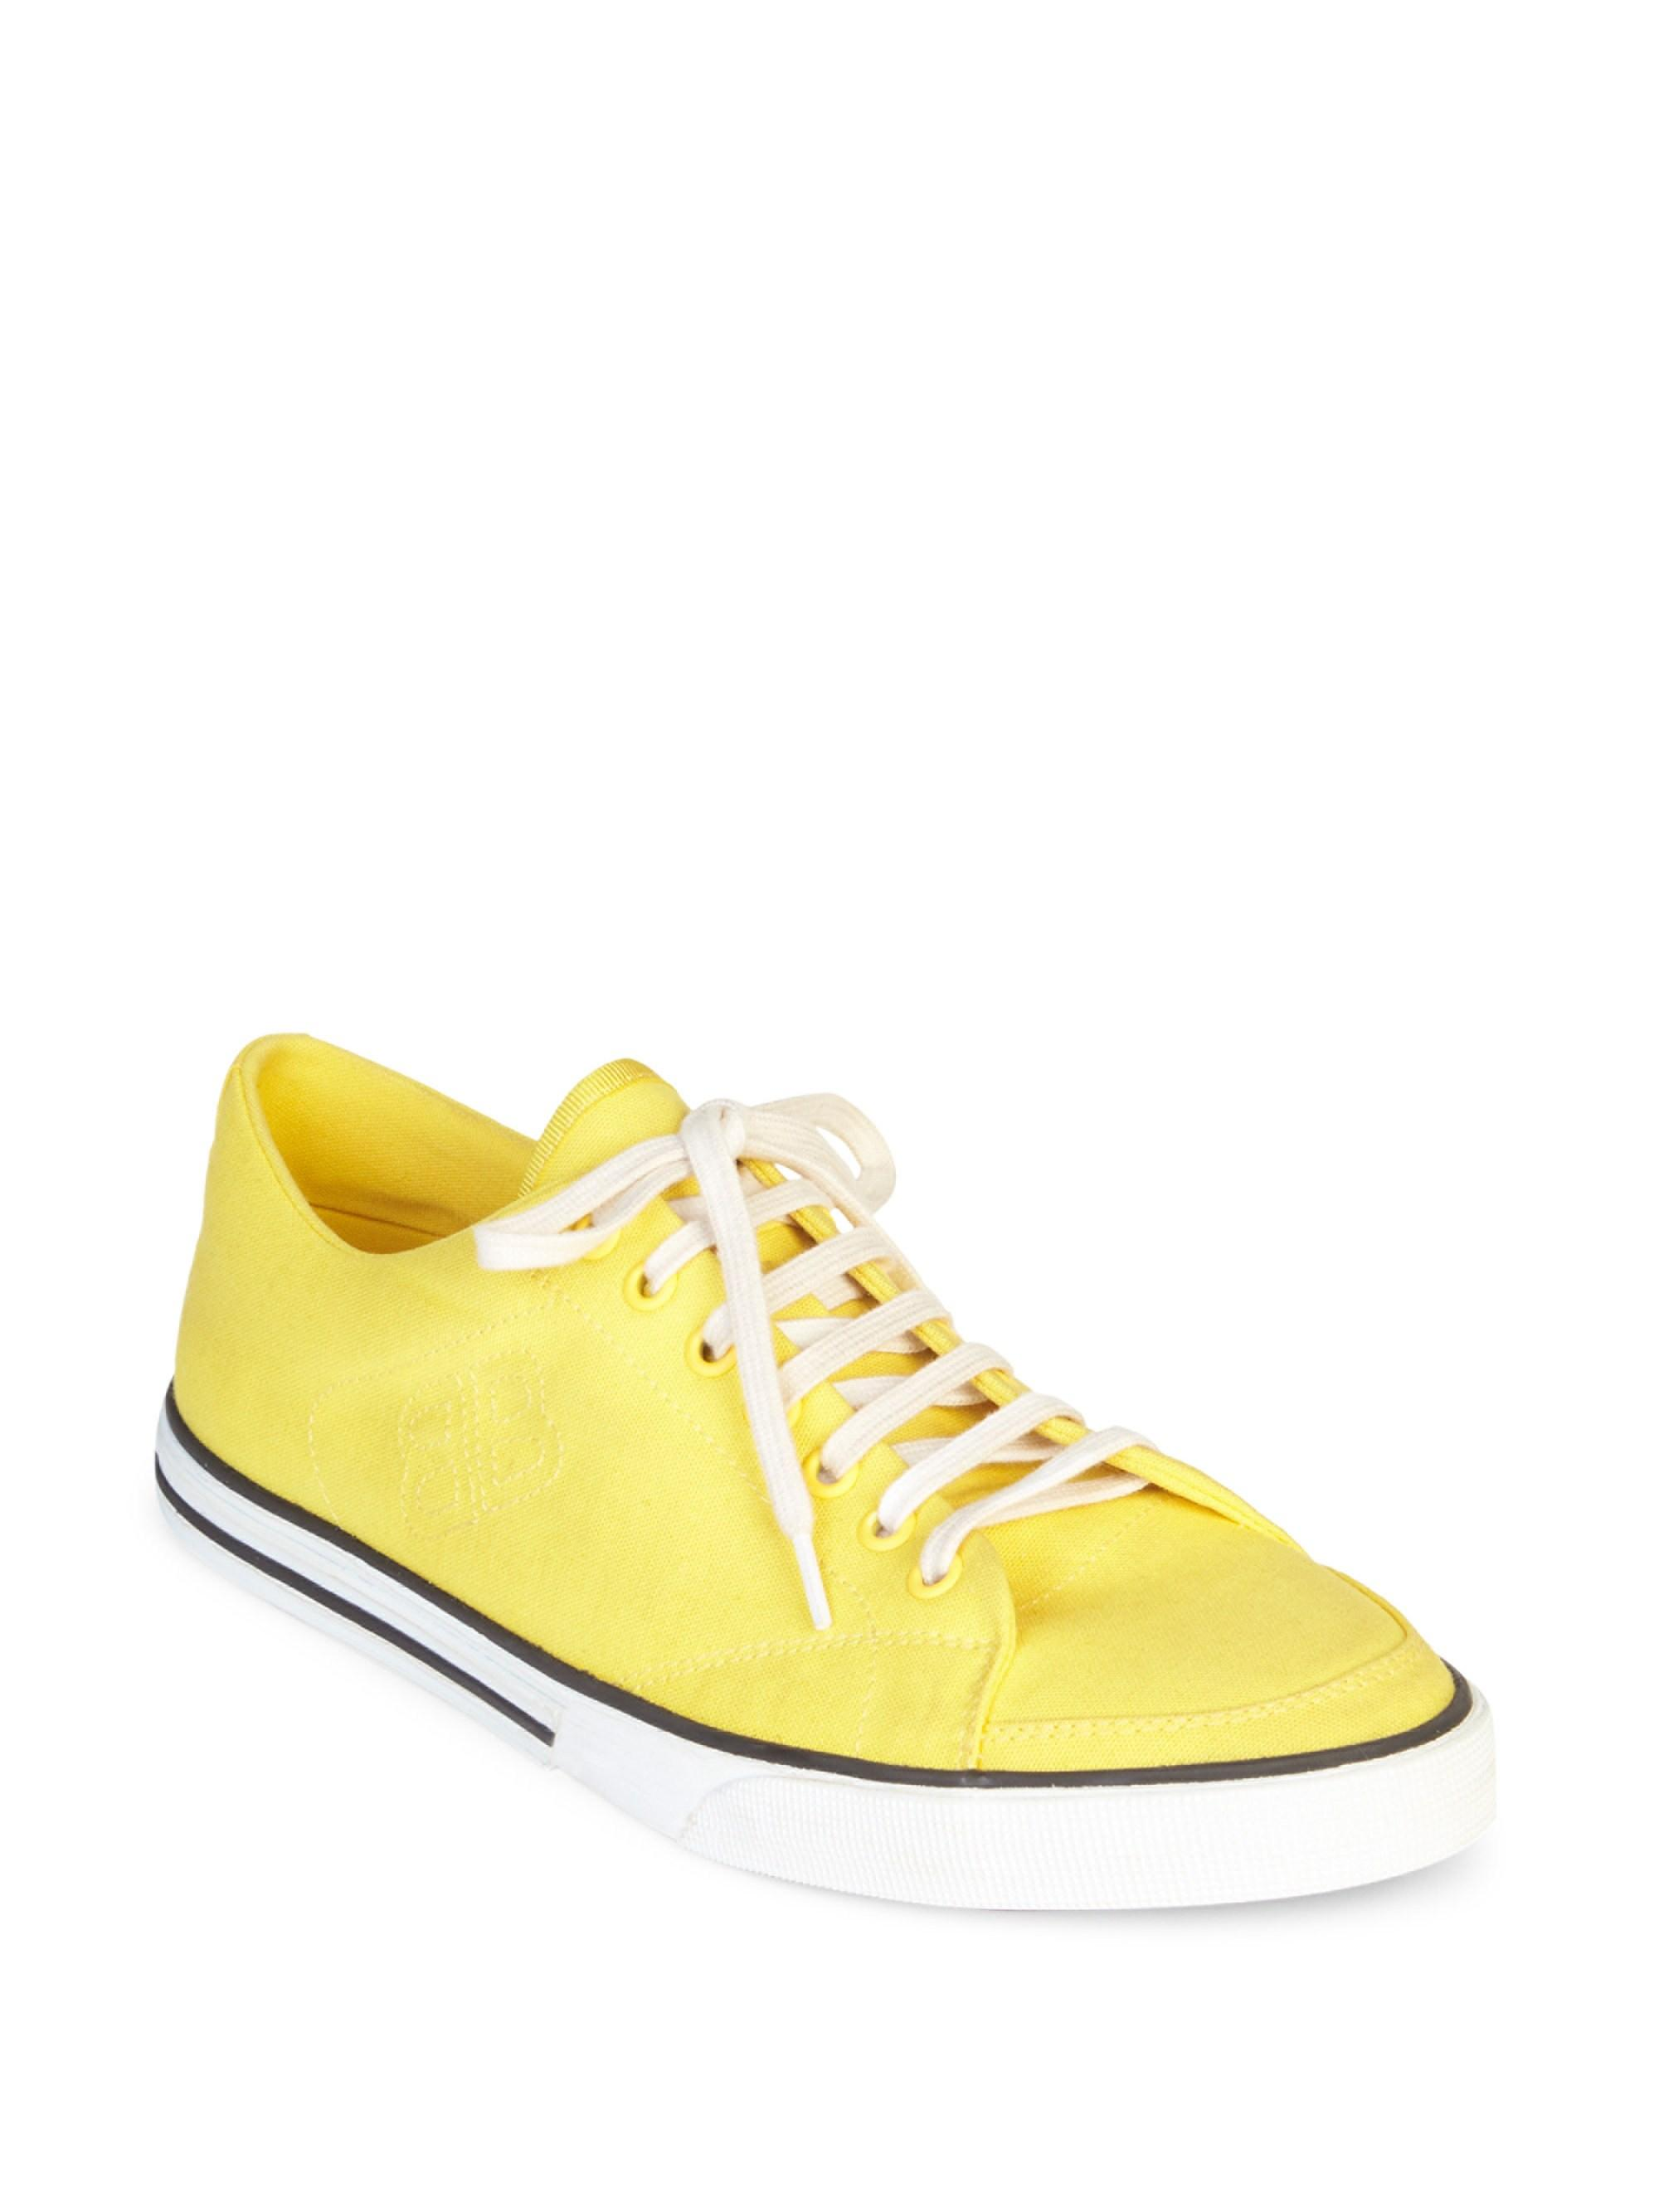 a1df098621d Balenciaga Canvas Logo Sole Sneakers in Yellow for Men - Lyst